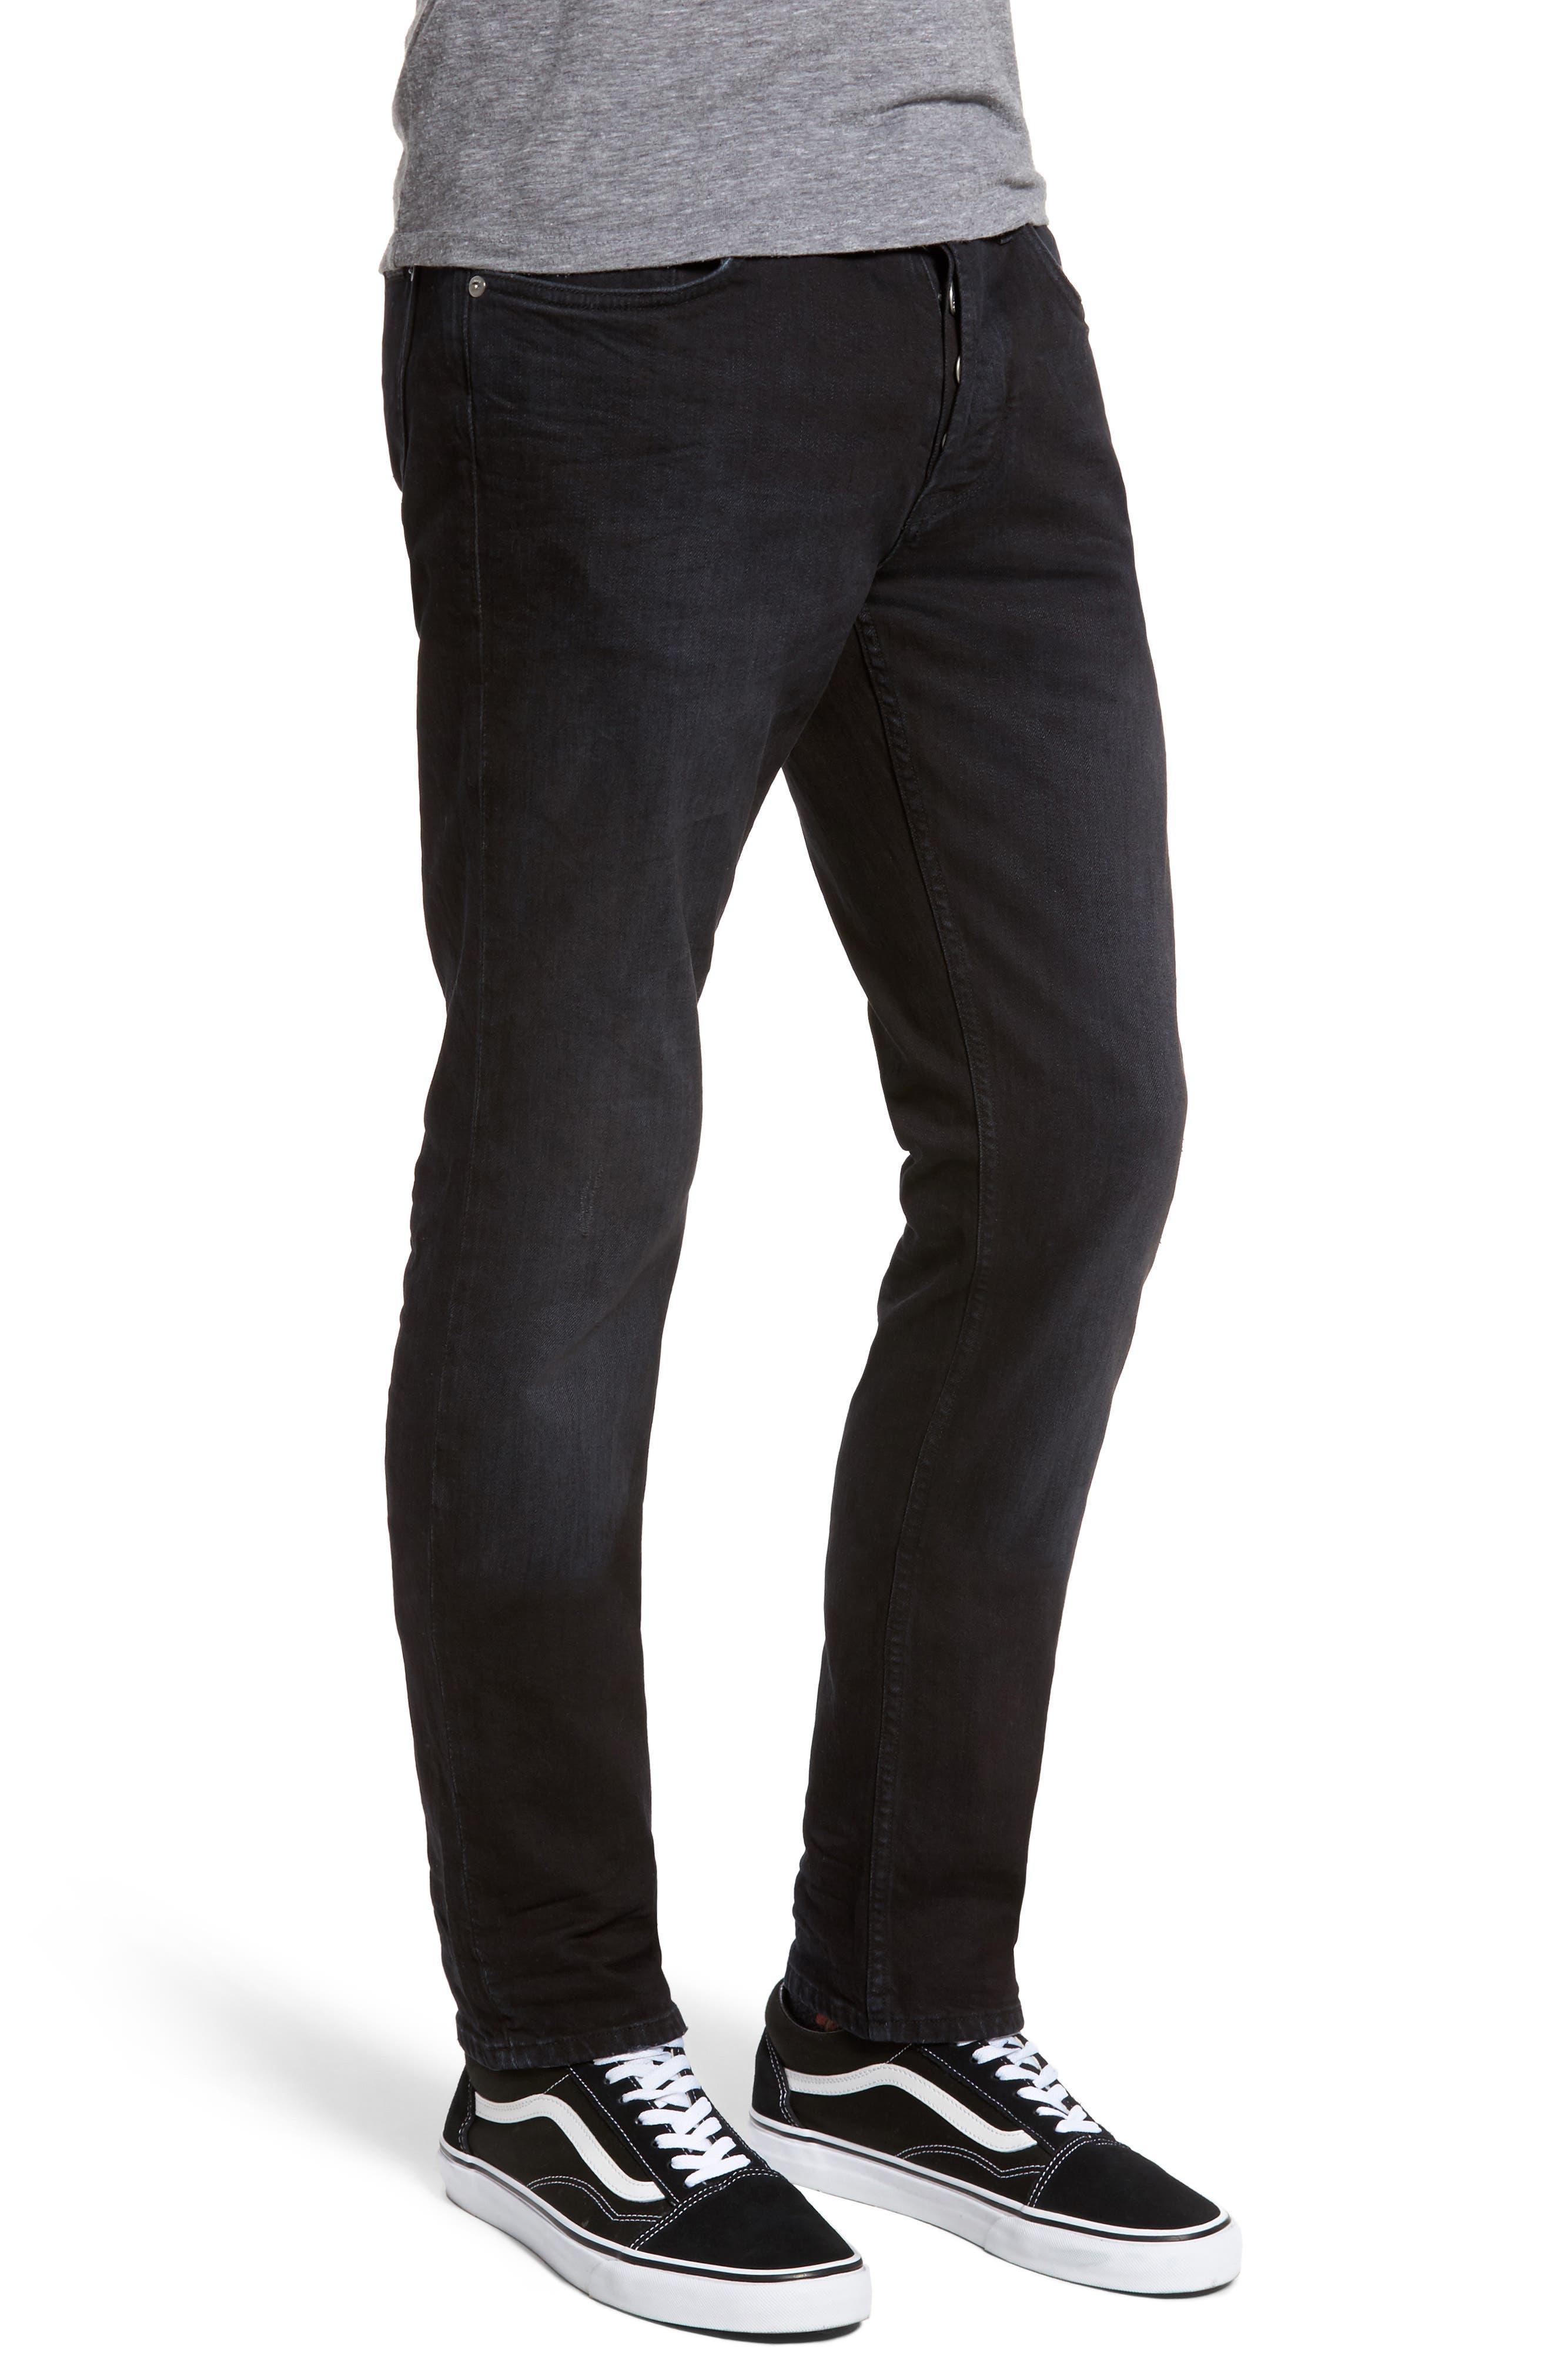 Sartor Skinny Fit Jeans,                             Alternate thumbnail 3, color,                             Low Key